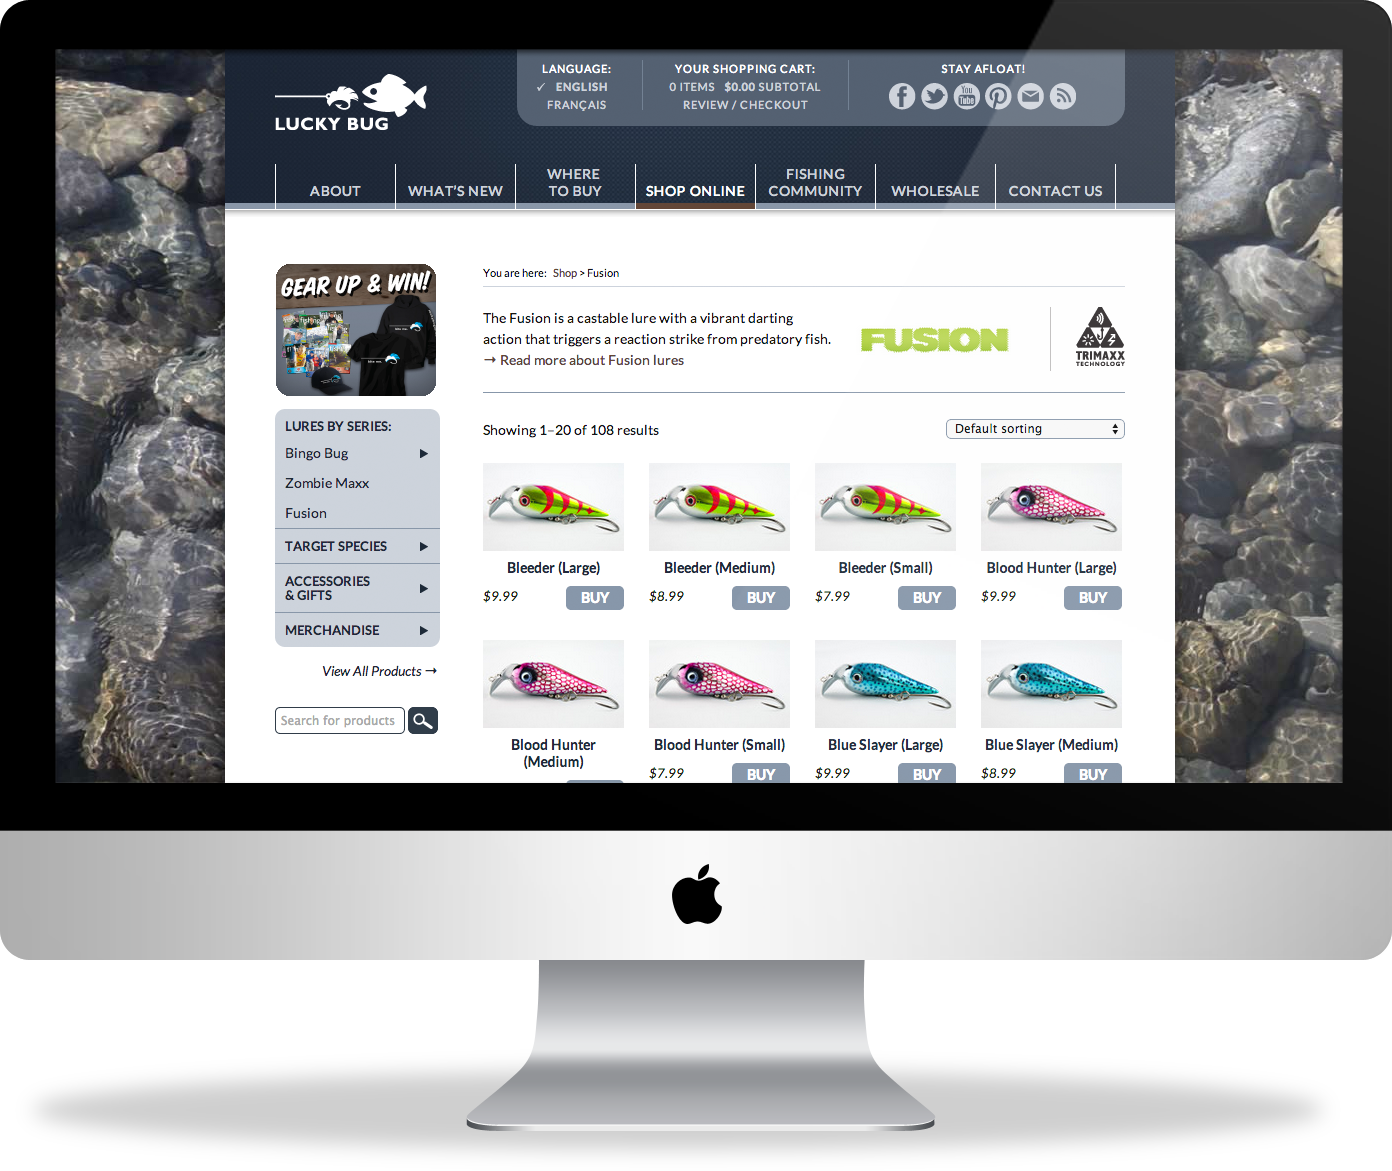 Lucky Bug Lures website design : e-commerce